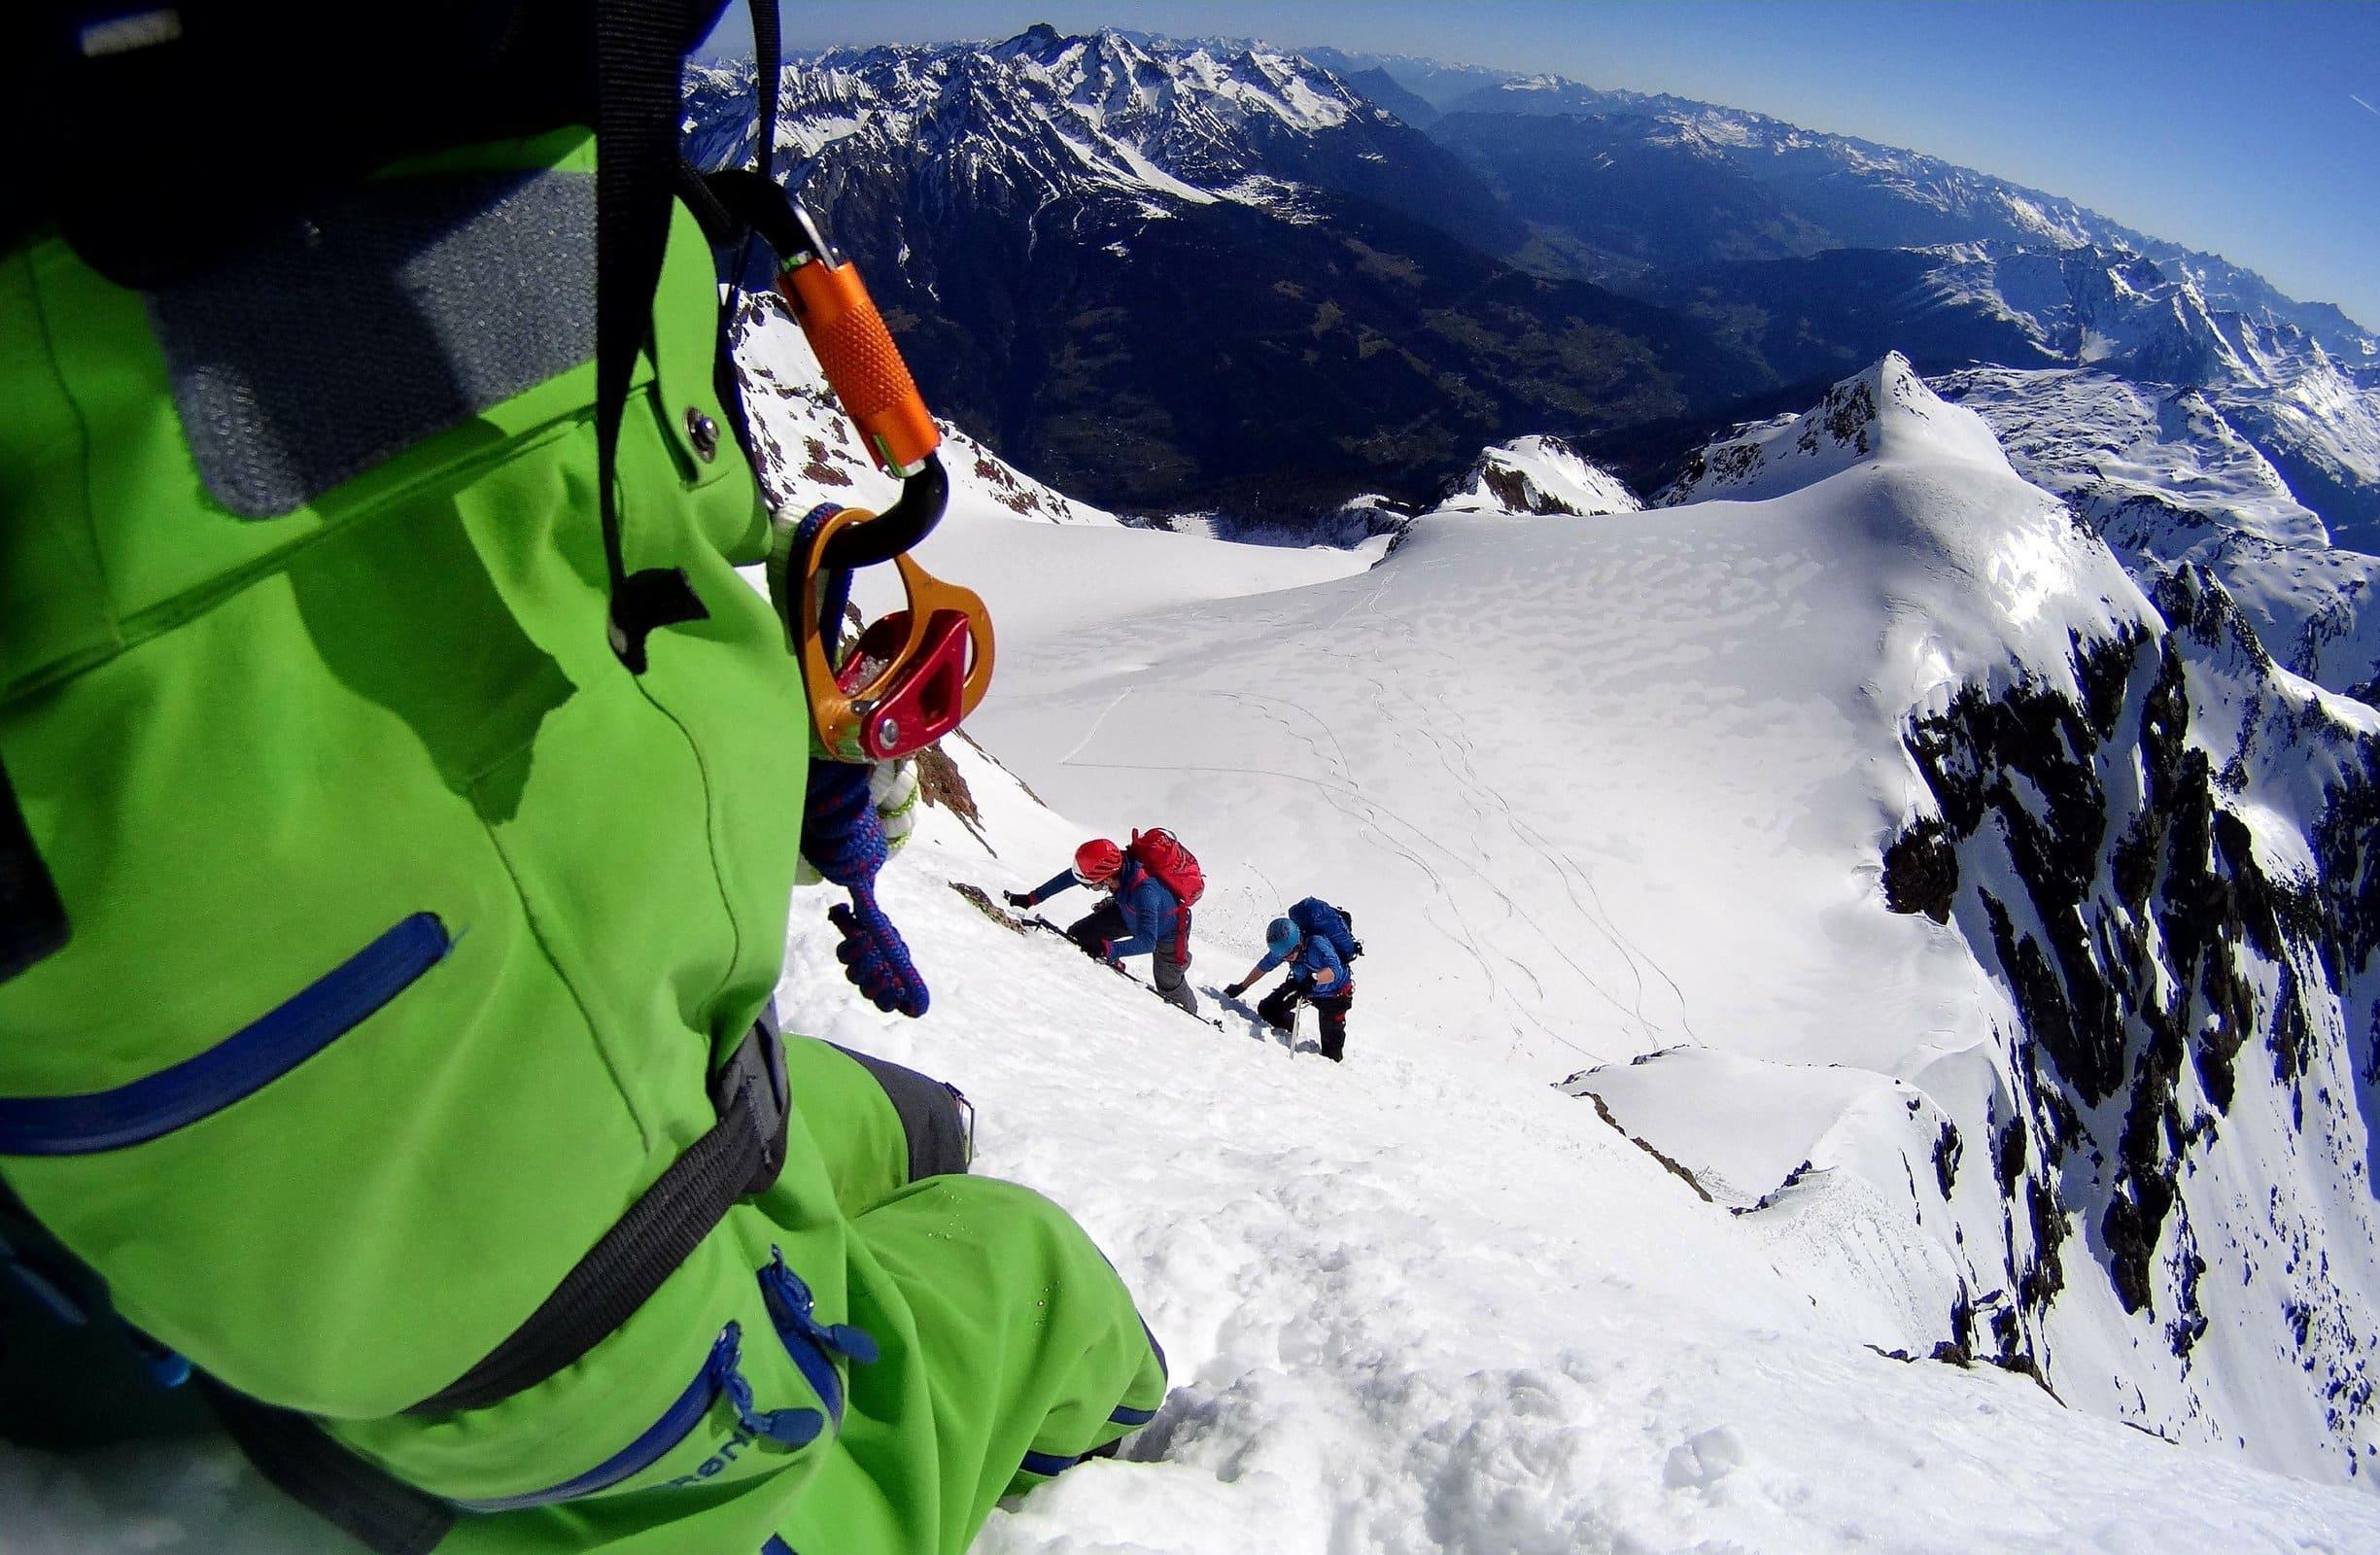 Skitour, Mogasi, Nicolai Dan Jørgensen